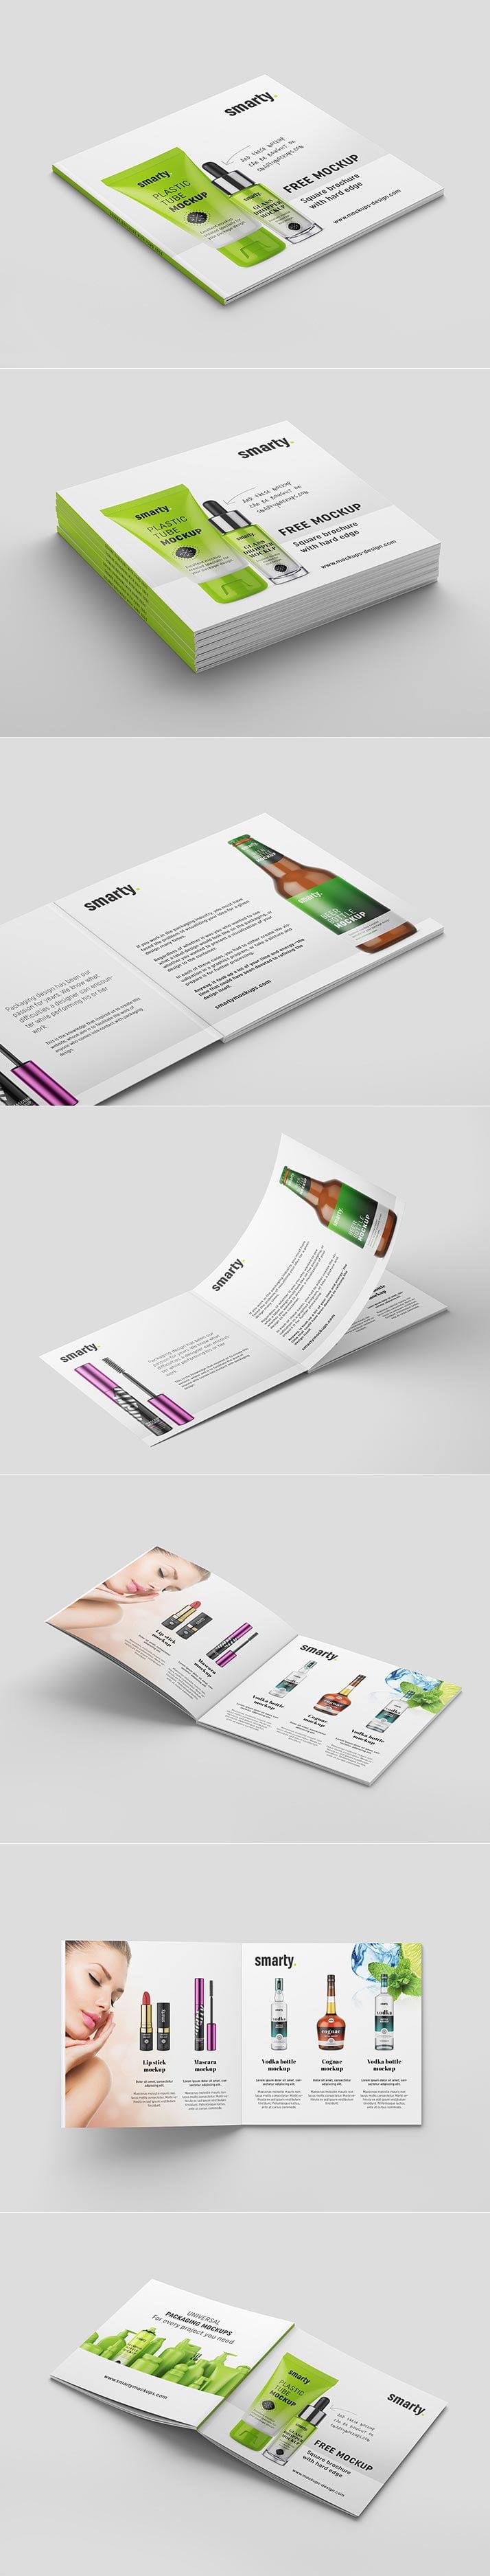 Free Square Brochure Mock-ups